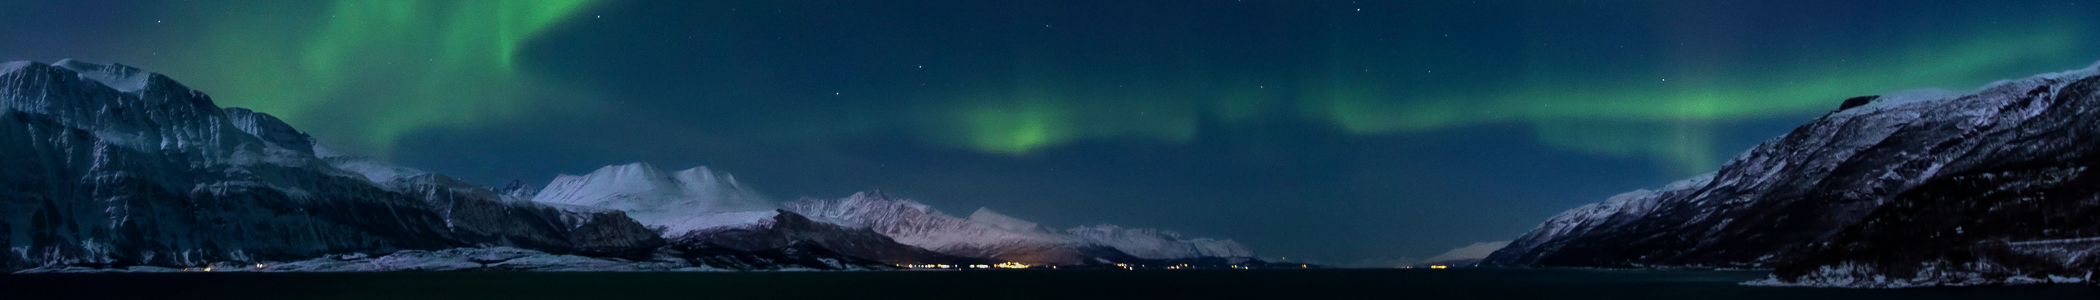 Northern_Lights-banner1